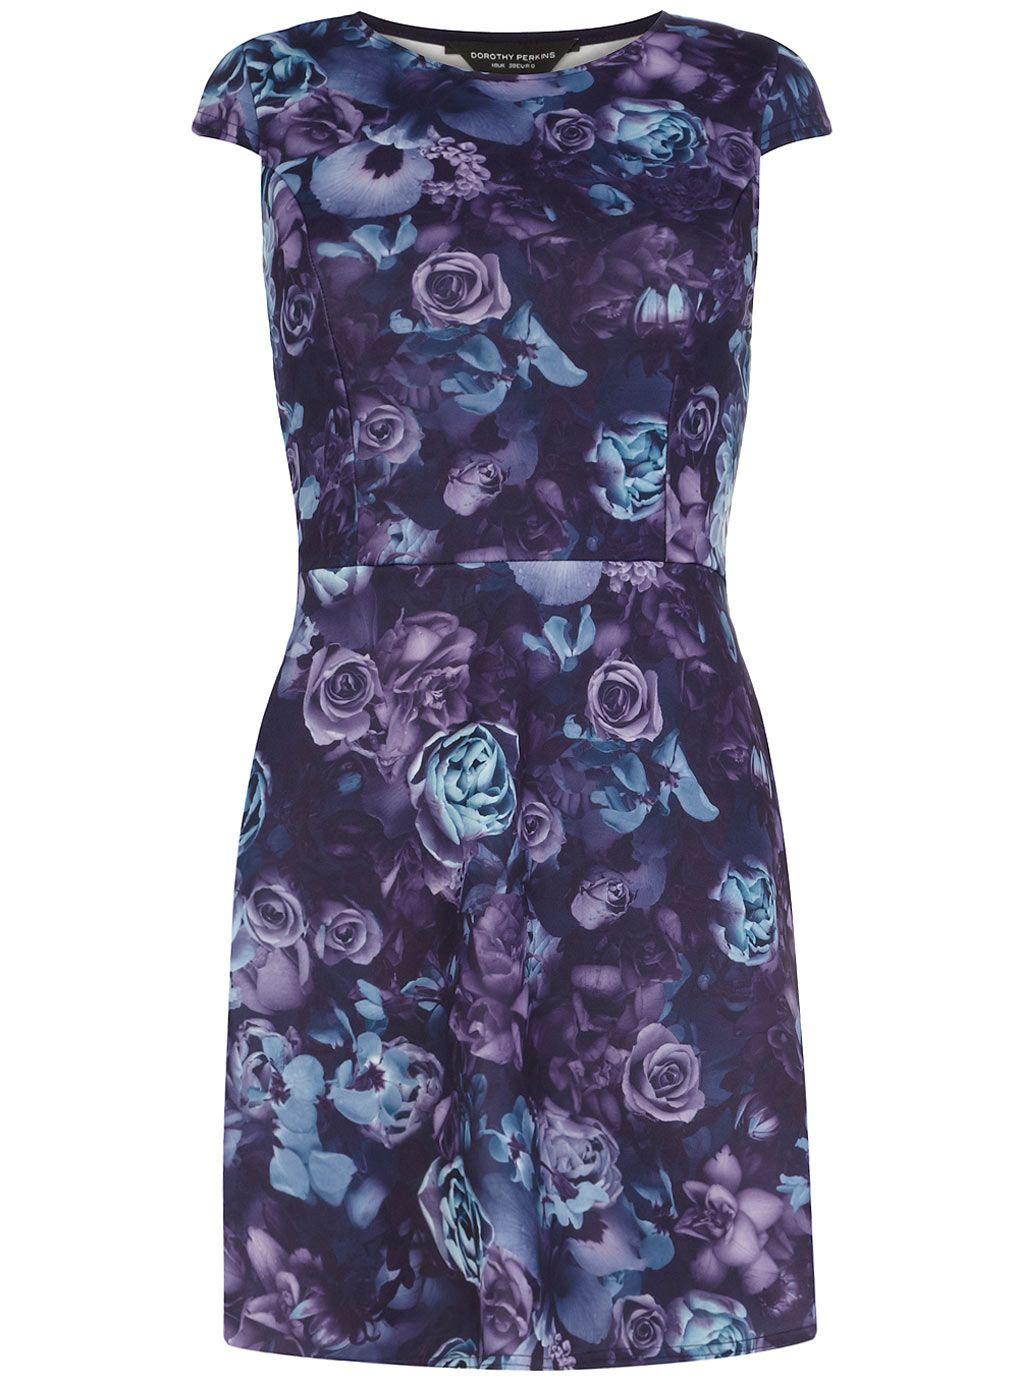 Purple and blue | In My Dream Short Dresses | Pinterest | Quiero ...